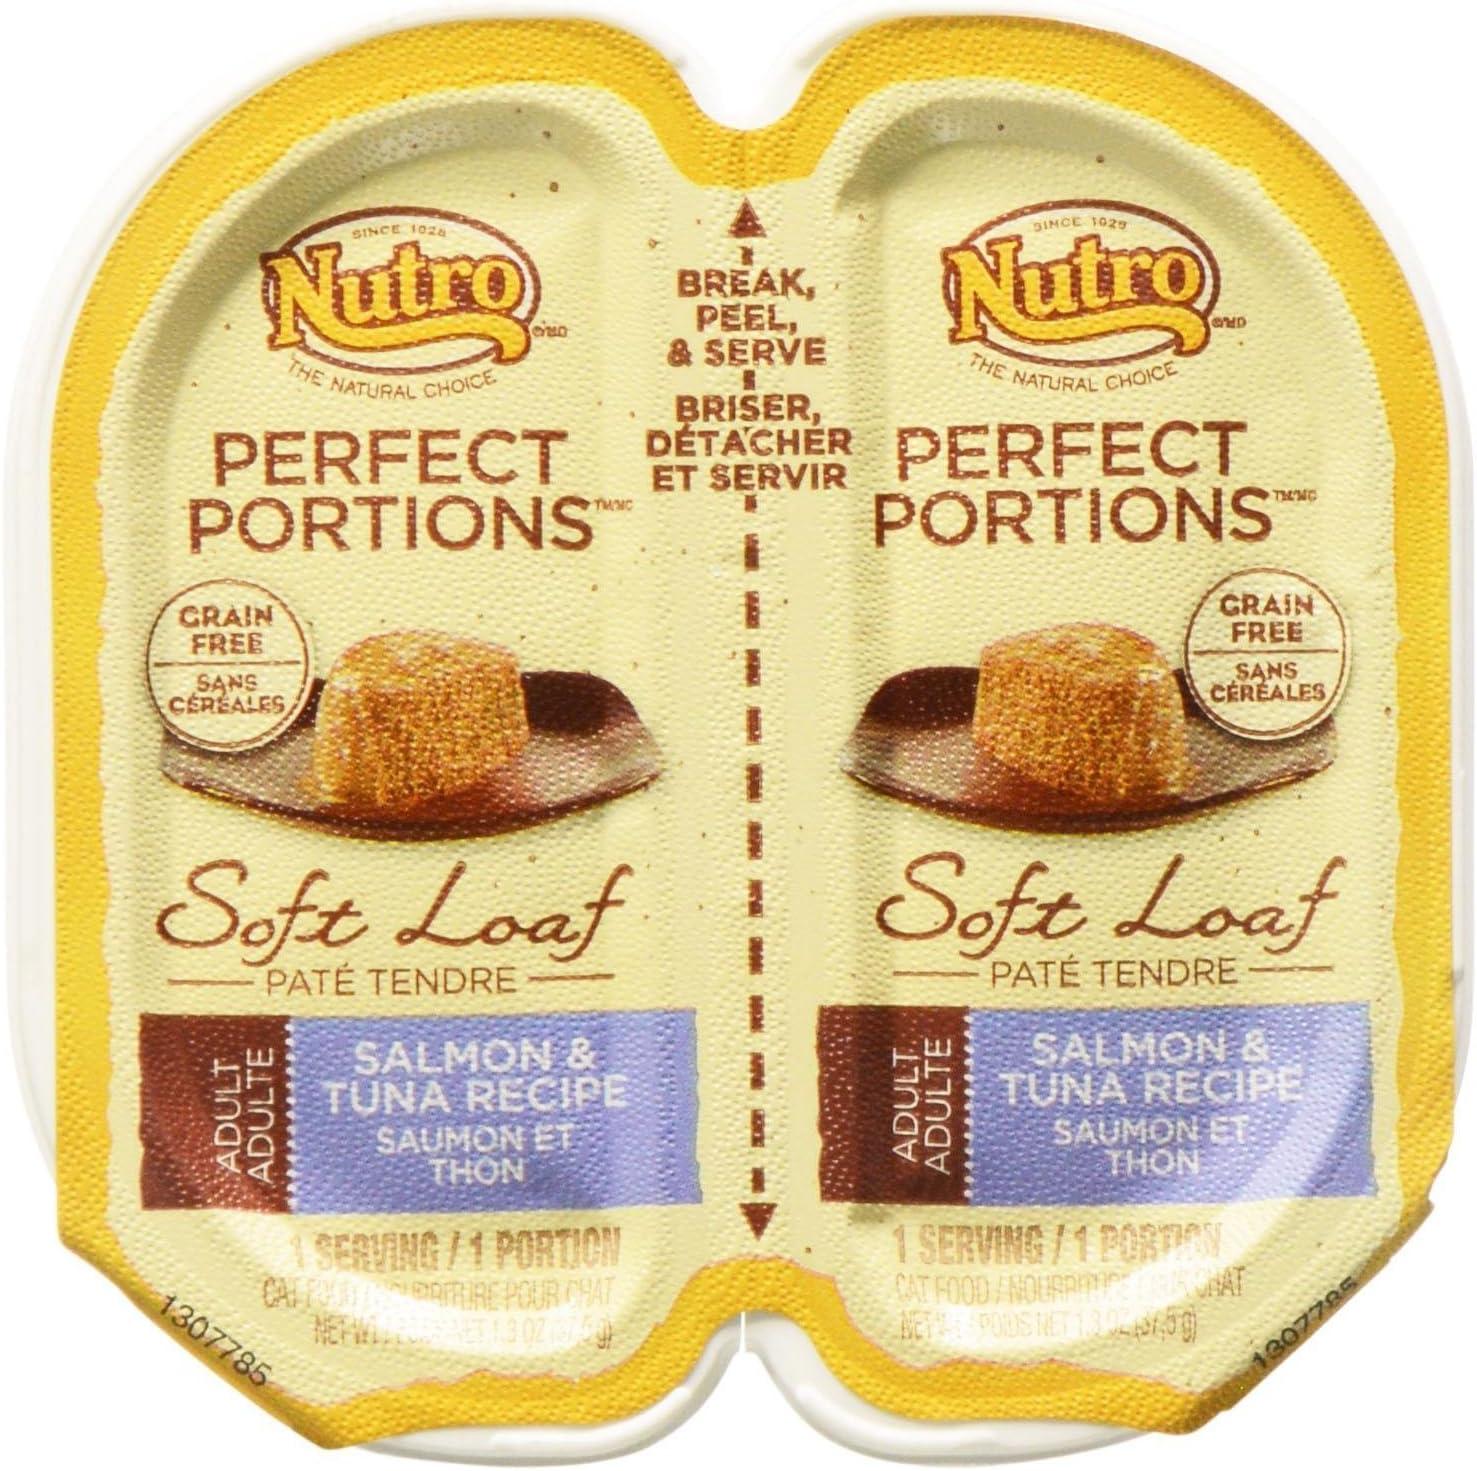 Nutro 50411520 24Ea/2.65Oz Grain Free Perfect Portions Soft Loaf Salmon & Tuna Recipe Cat Food, One Size